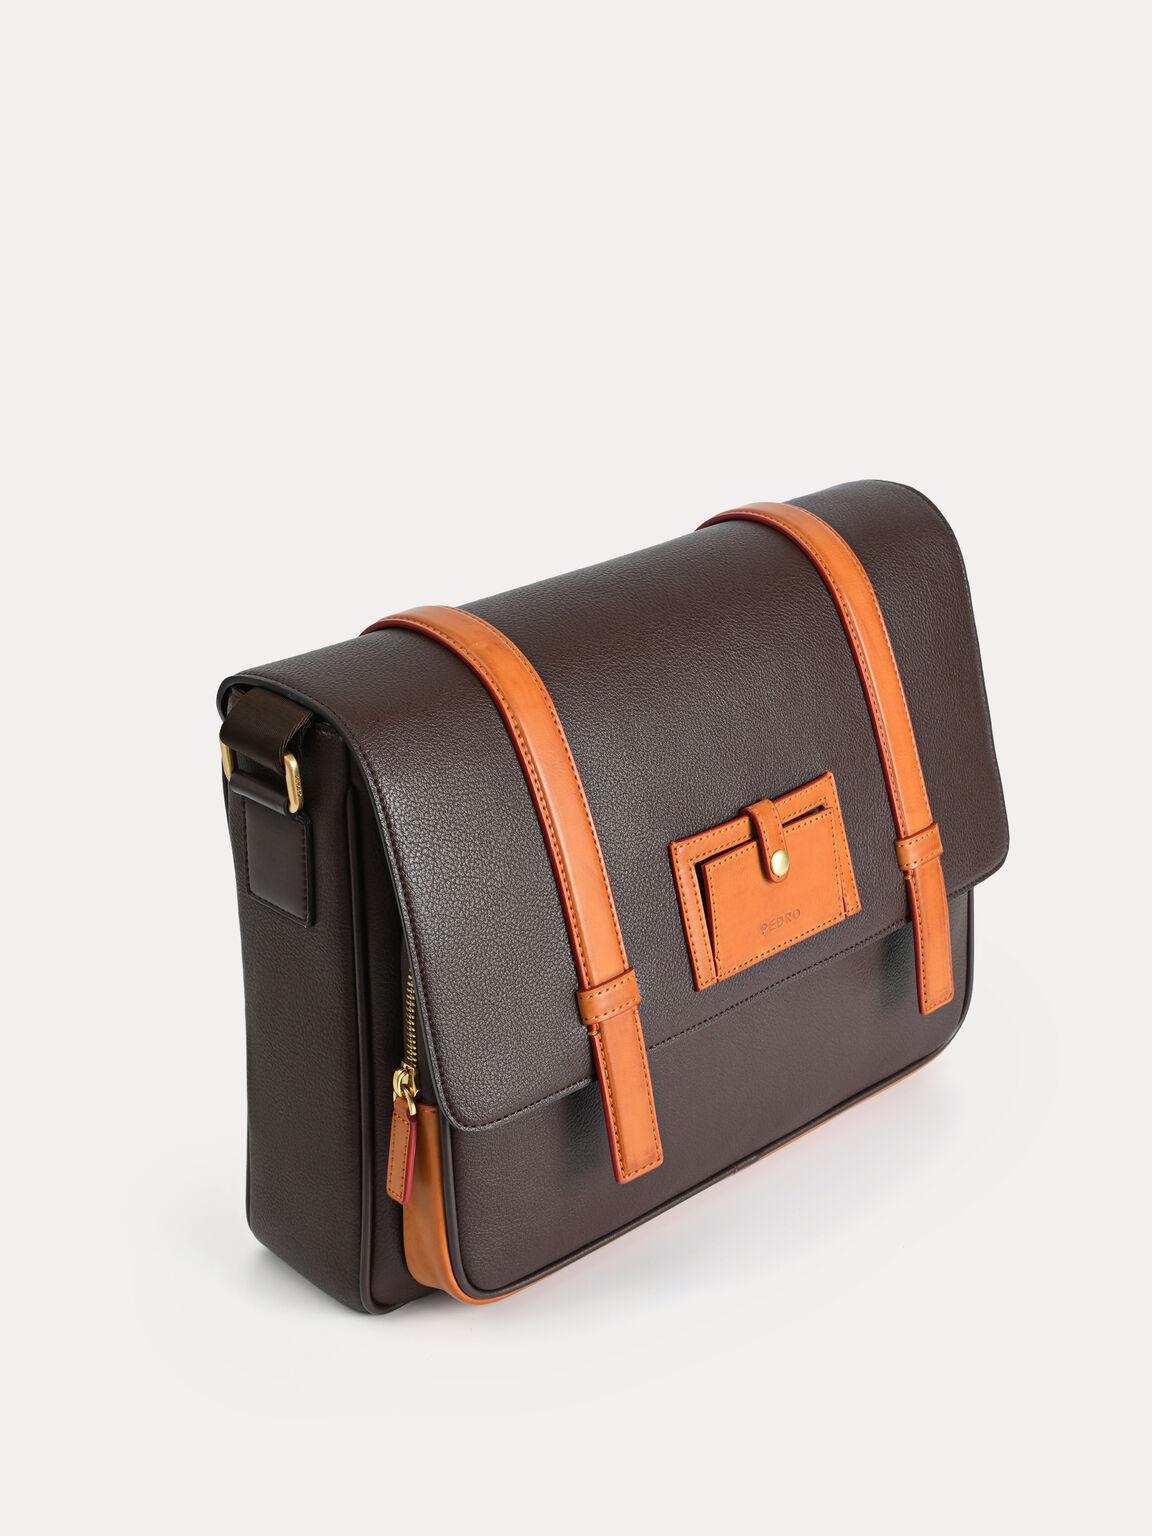 休閒郵差包, 棕色, hi-res